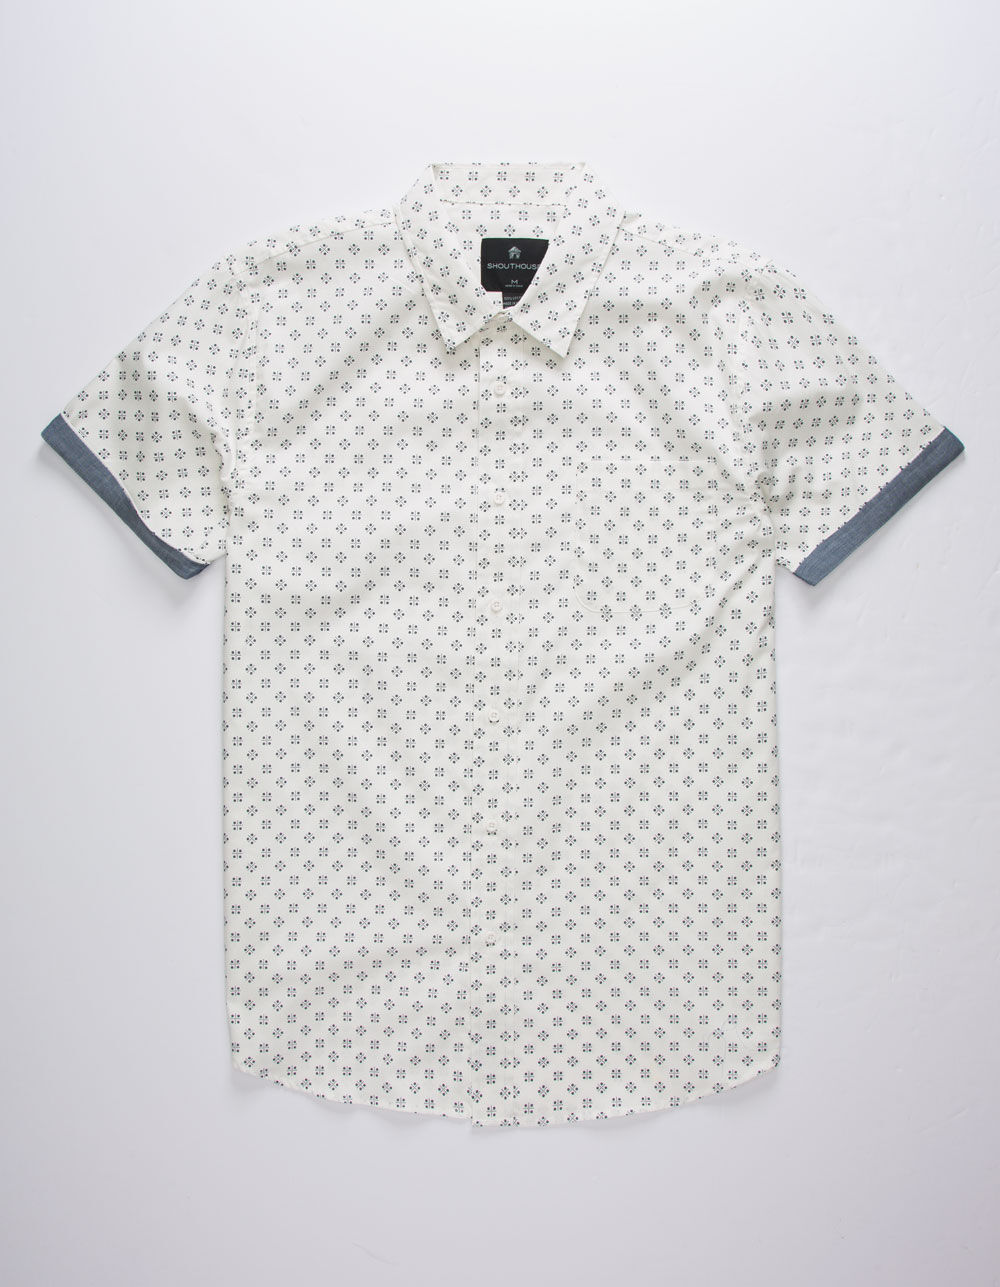 SHOUTHOUSE La Brea White Shirt